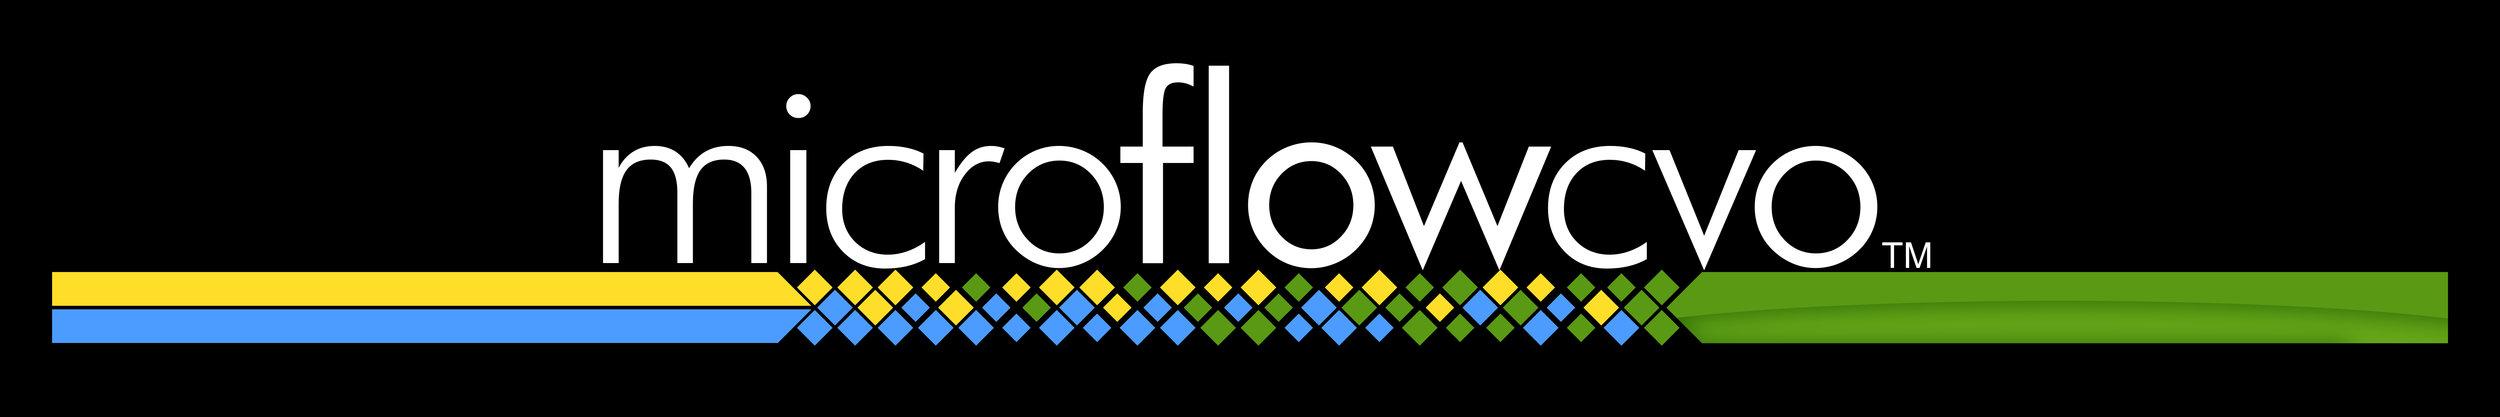 Microflow CVO.jpg